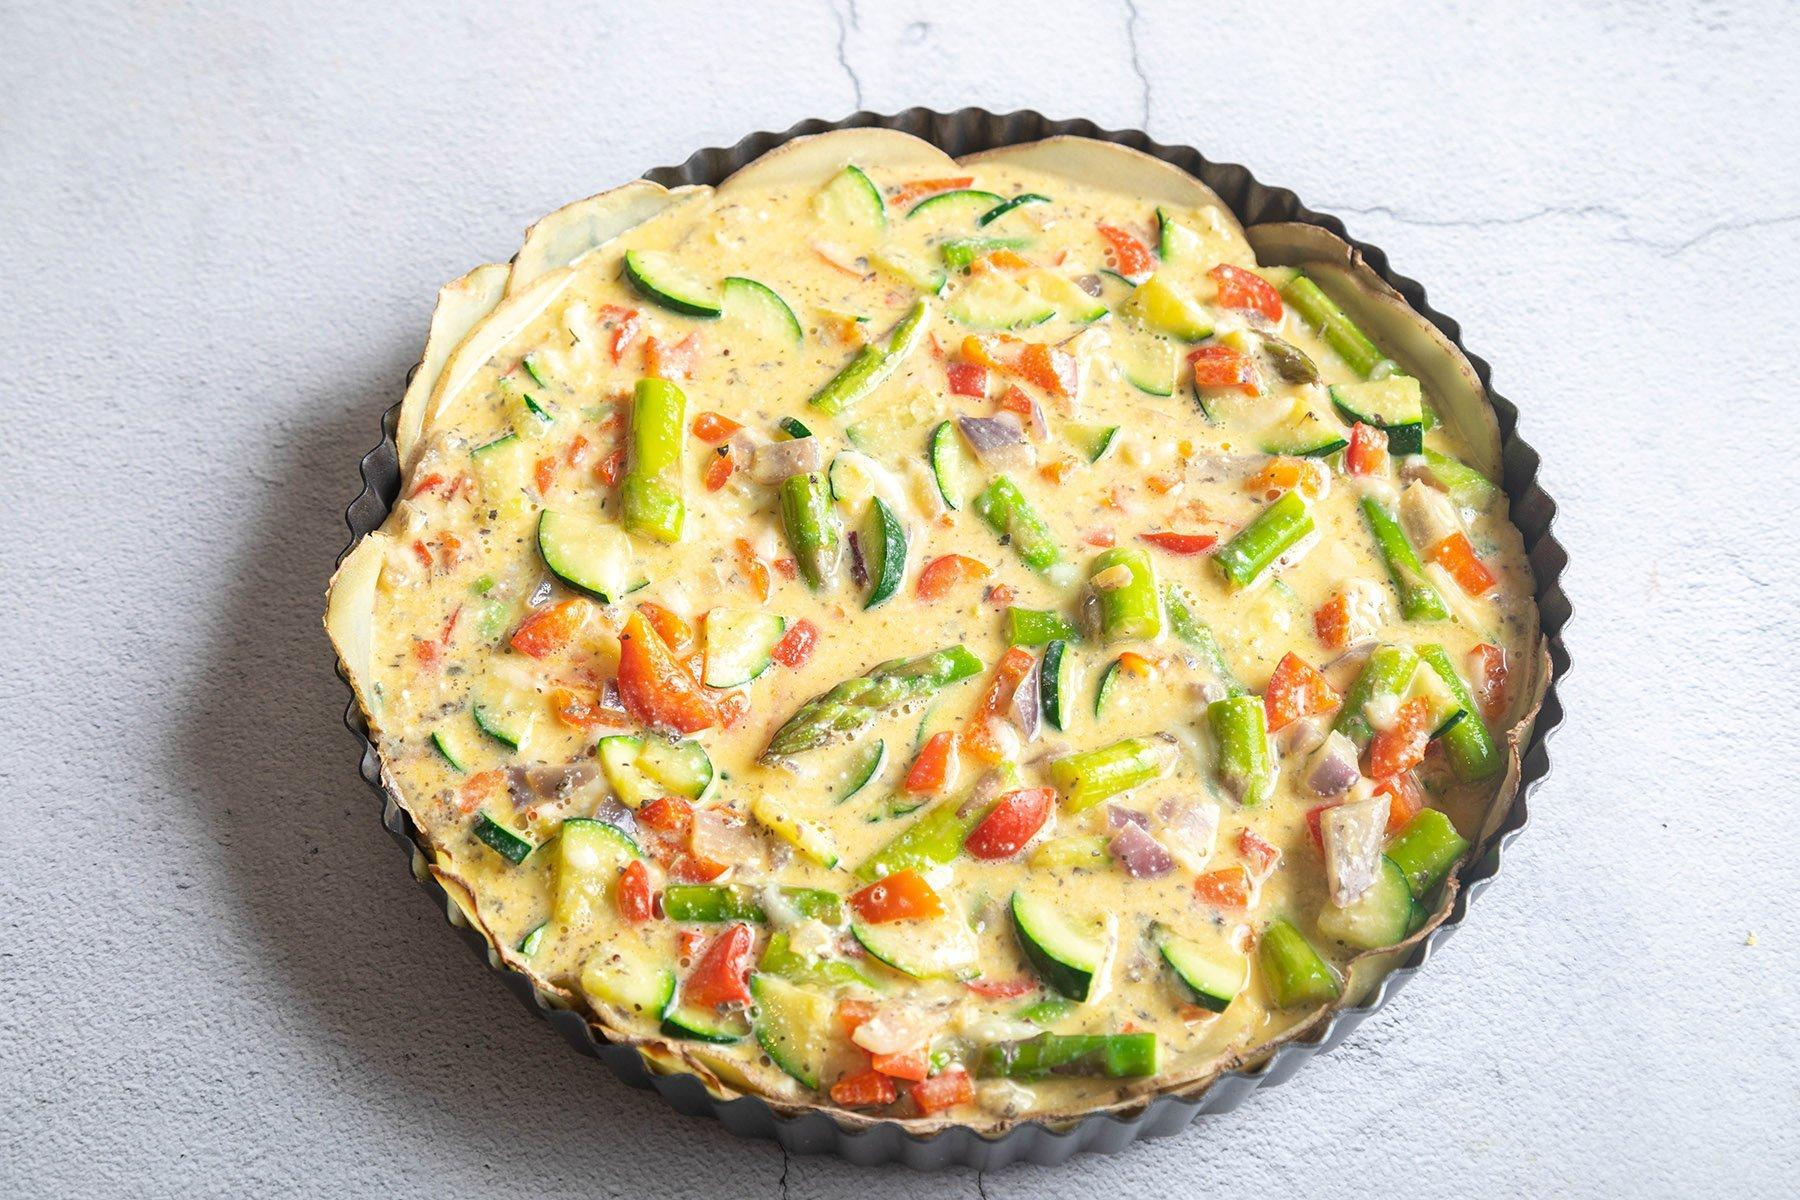 pour vegetable egg mixture into prepared pie pan